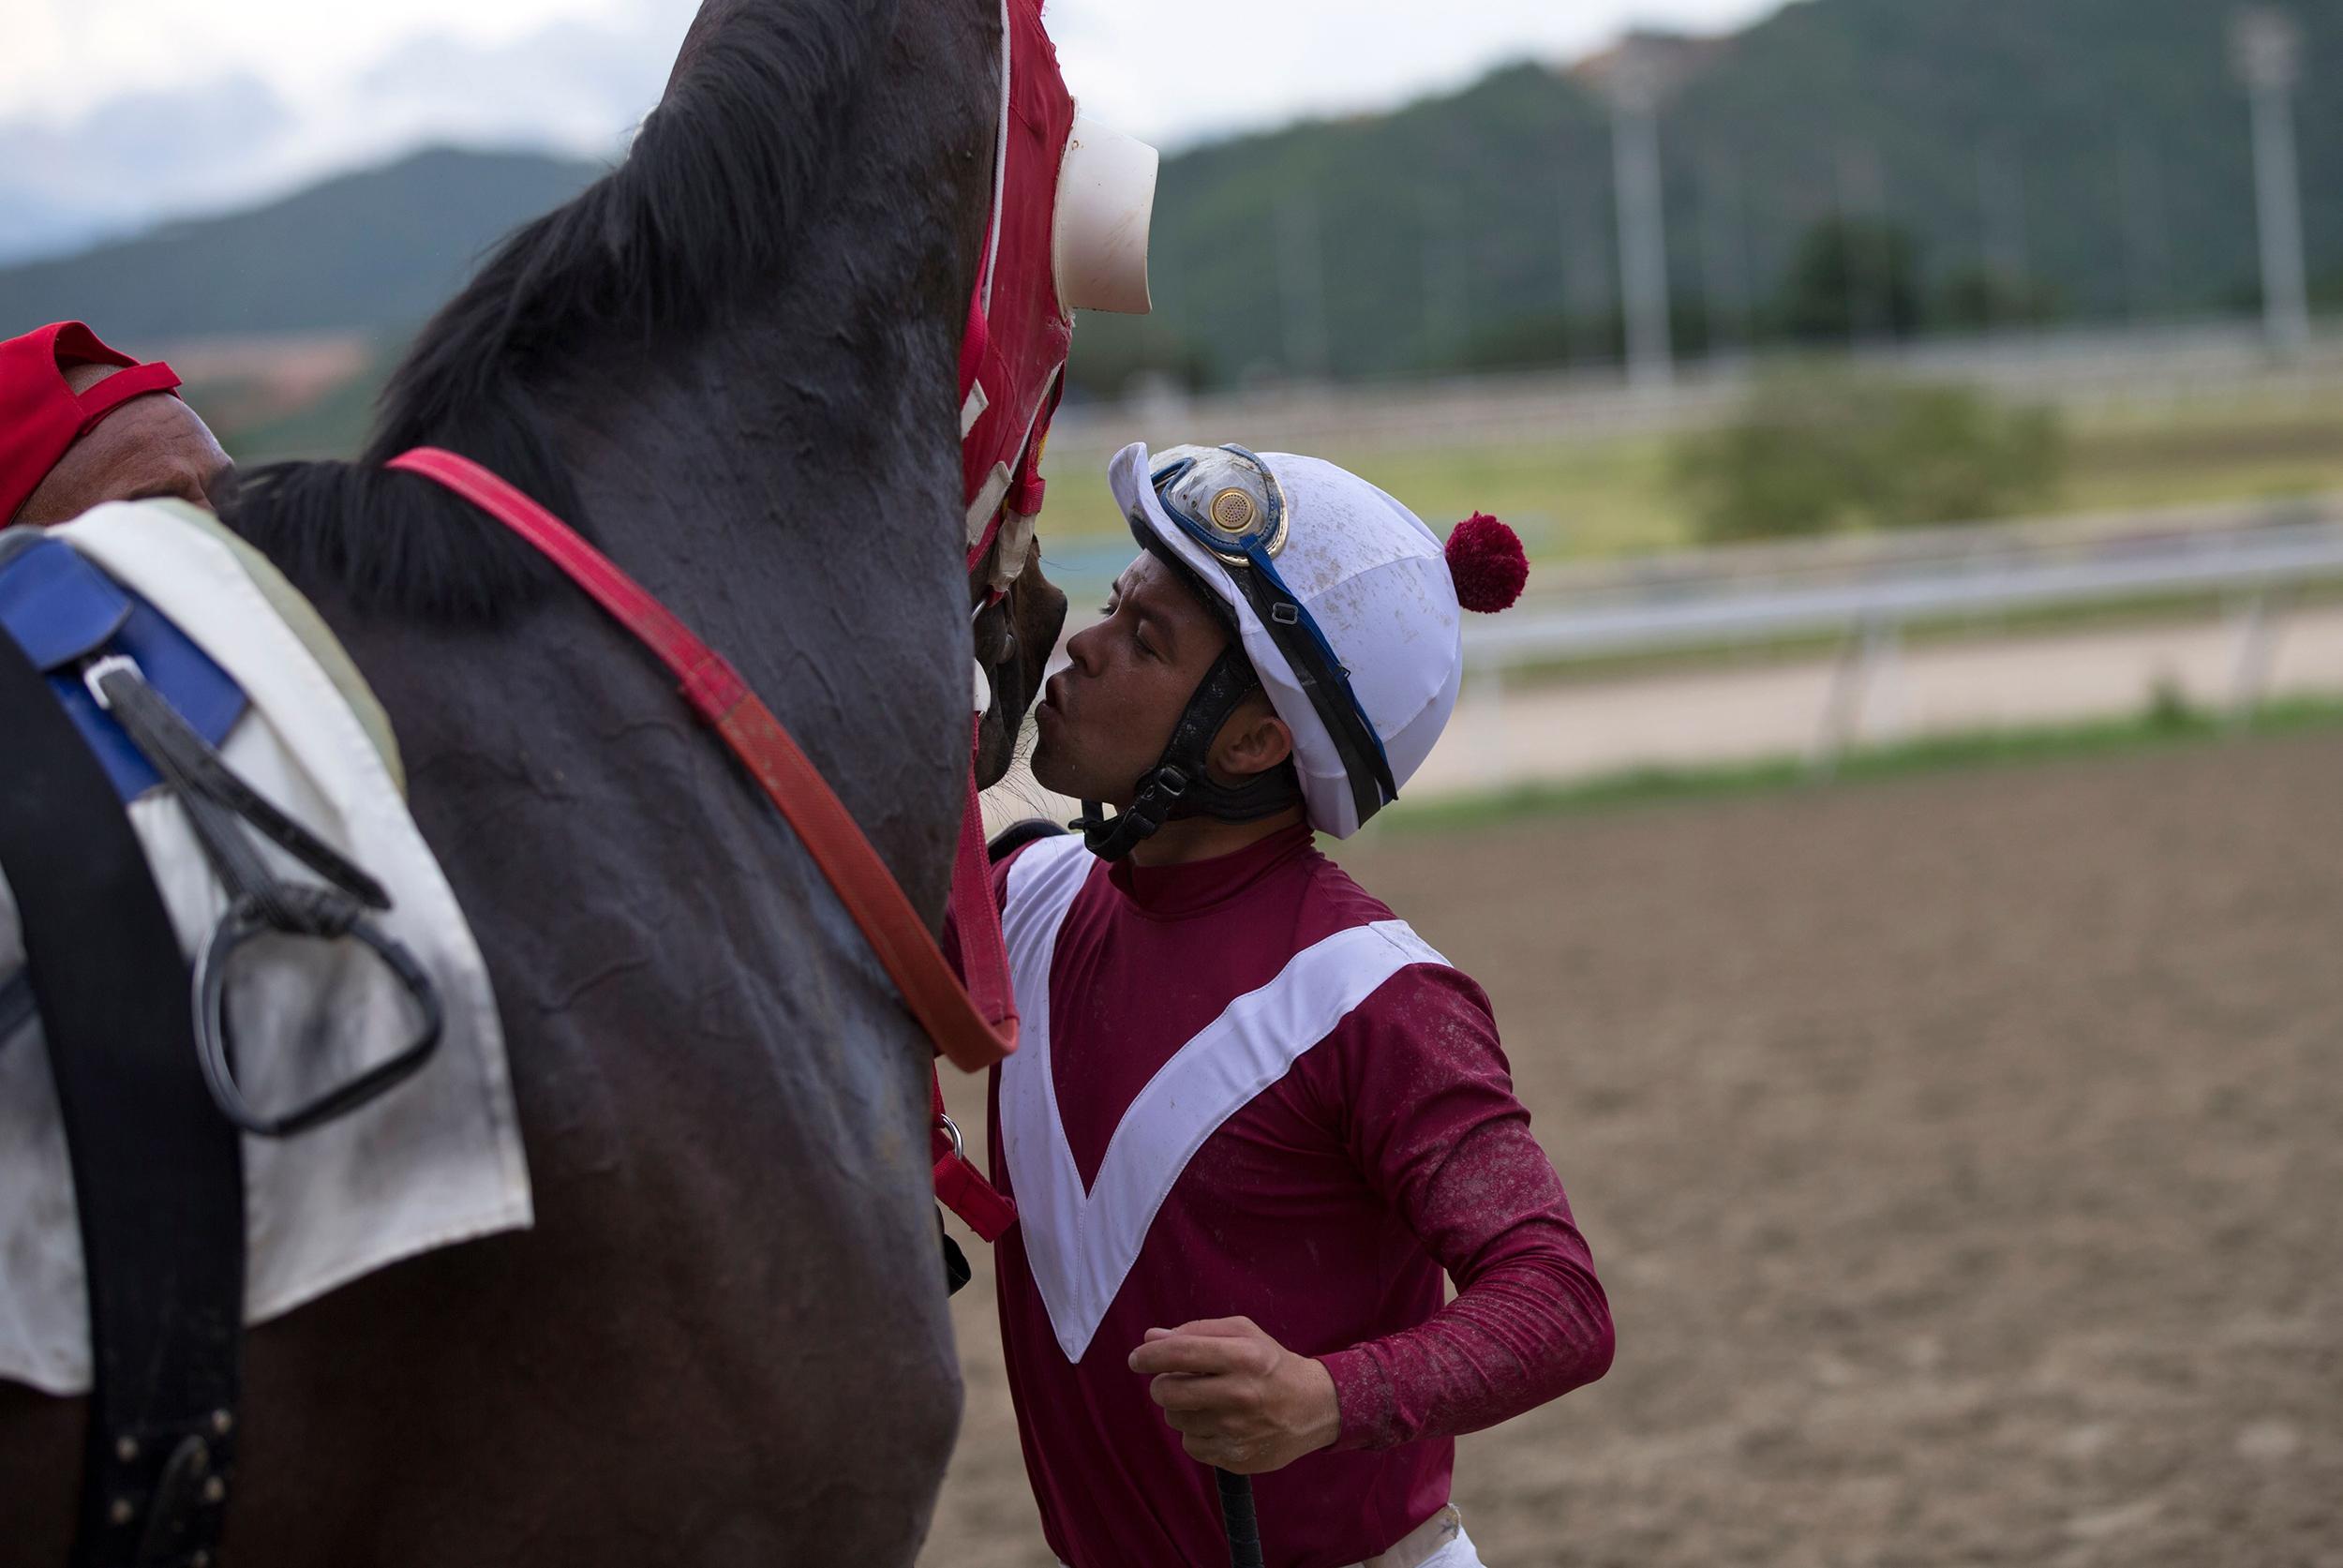 ladbrokes results horse racing